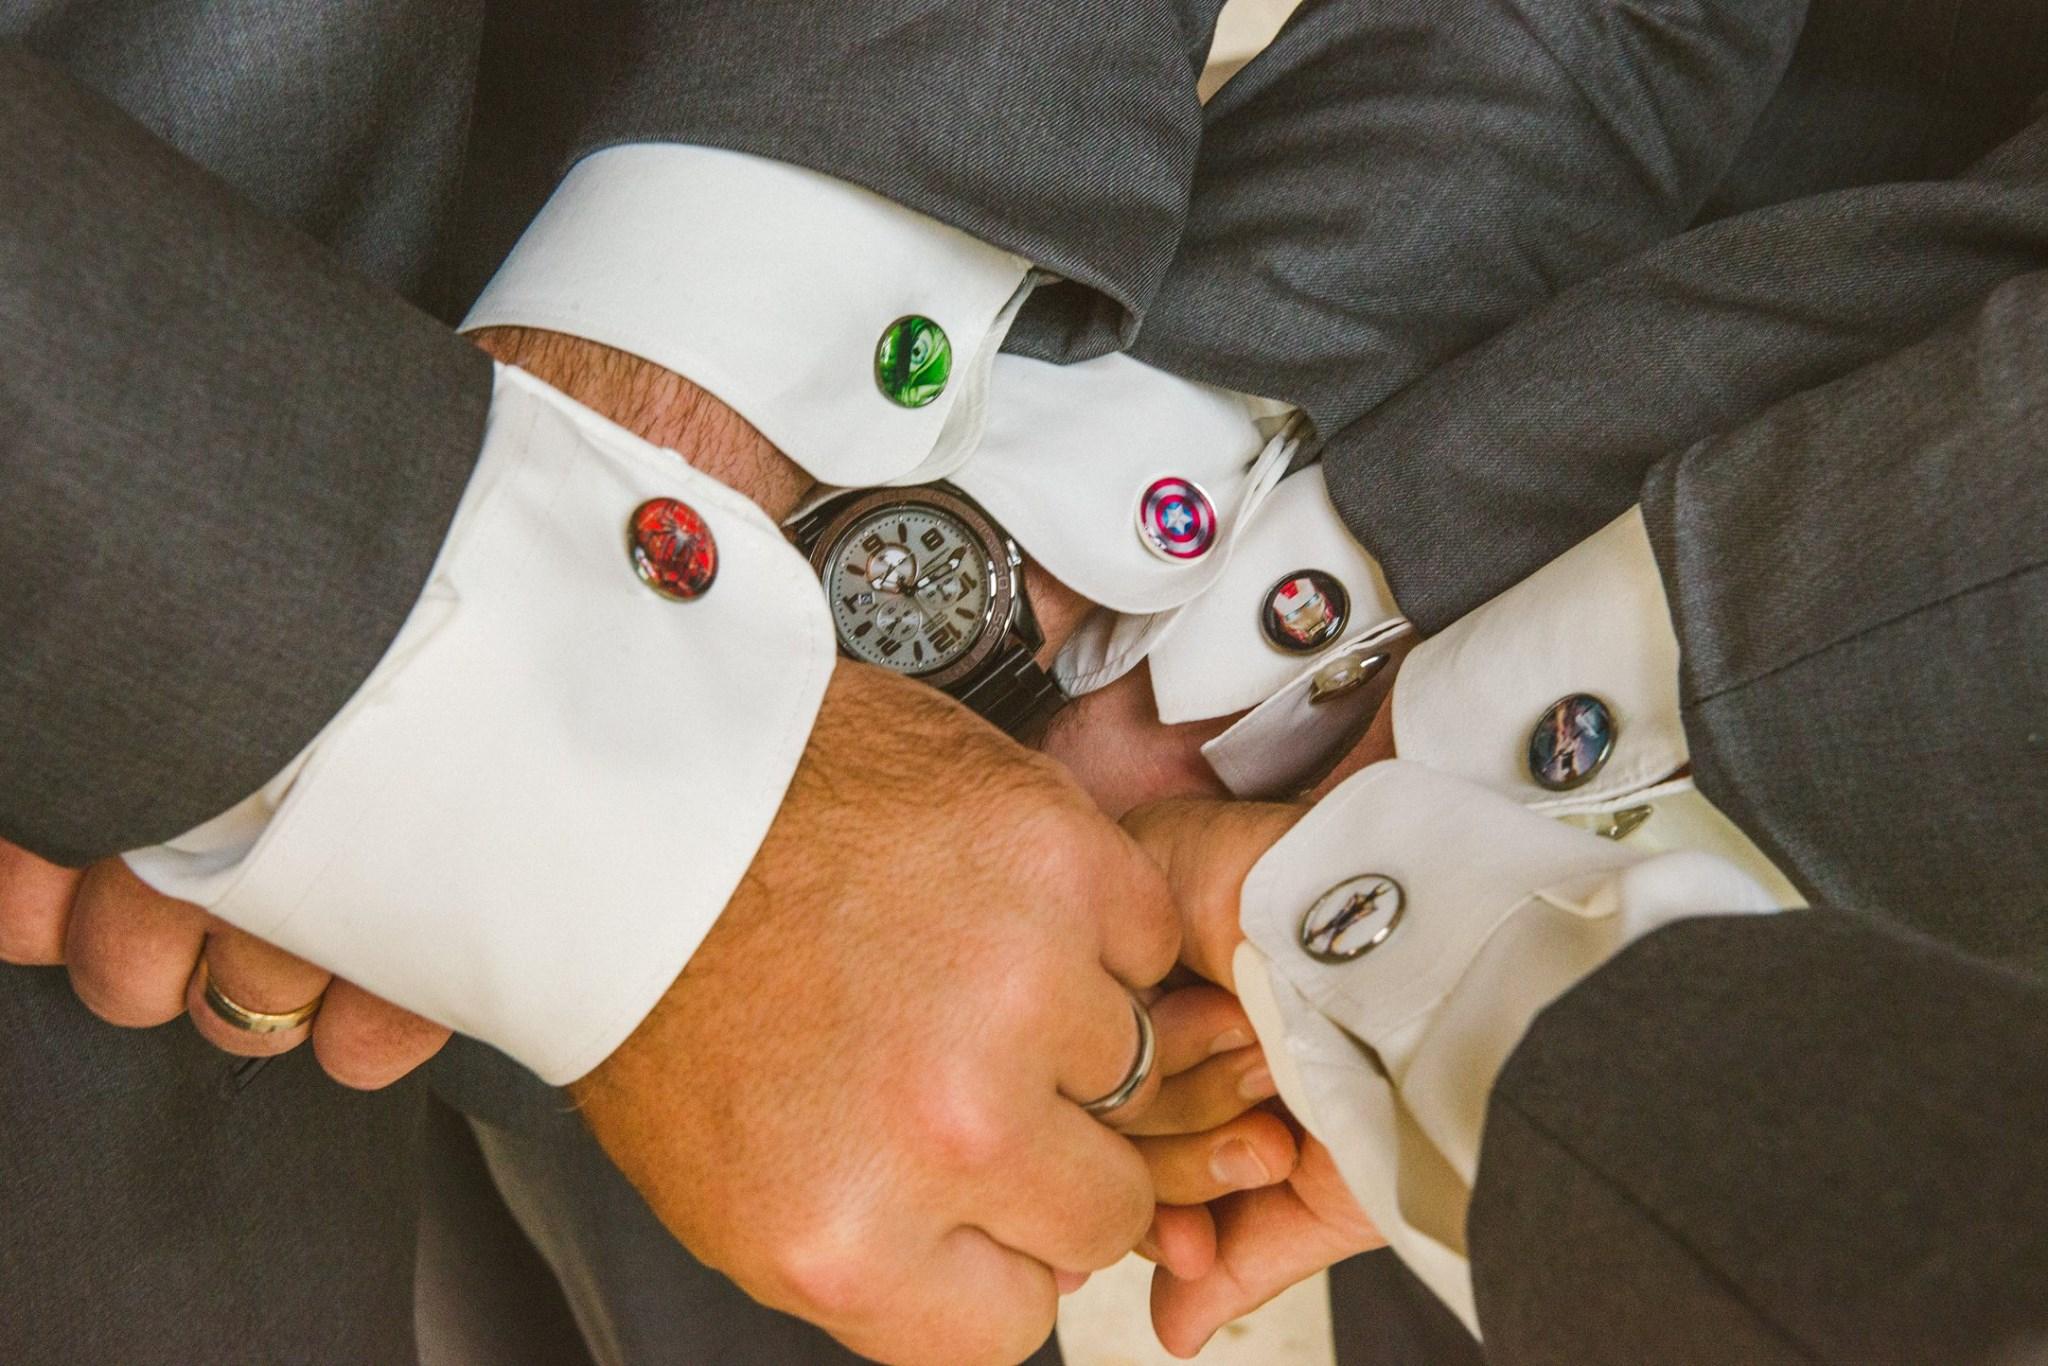 korn_self_titled_logo_new_cuff_links_men_weddings_grooms_groomsmen_gifts_dads_graduations_cufflinks_4.jpg